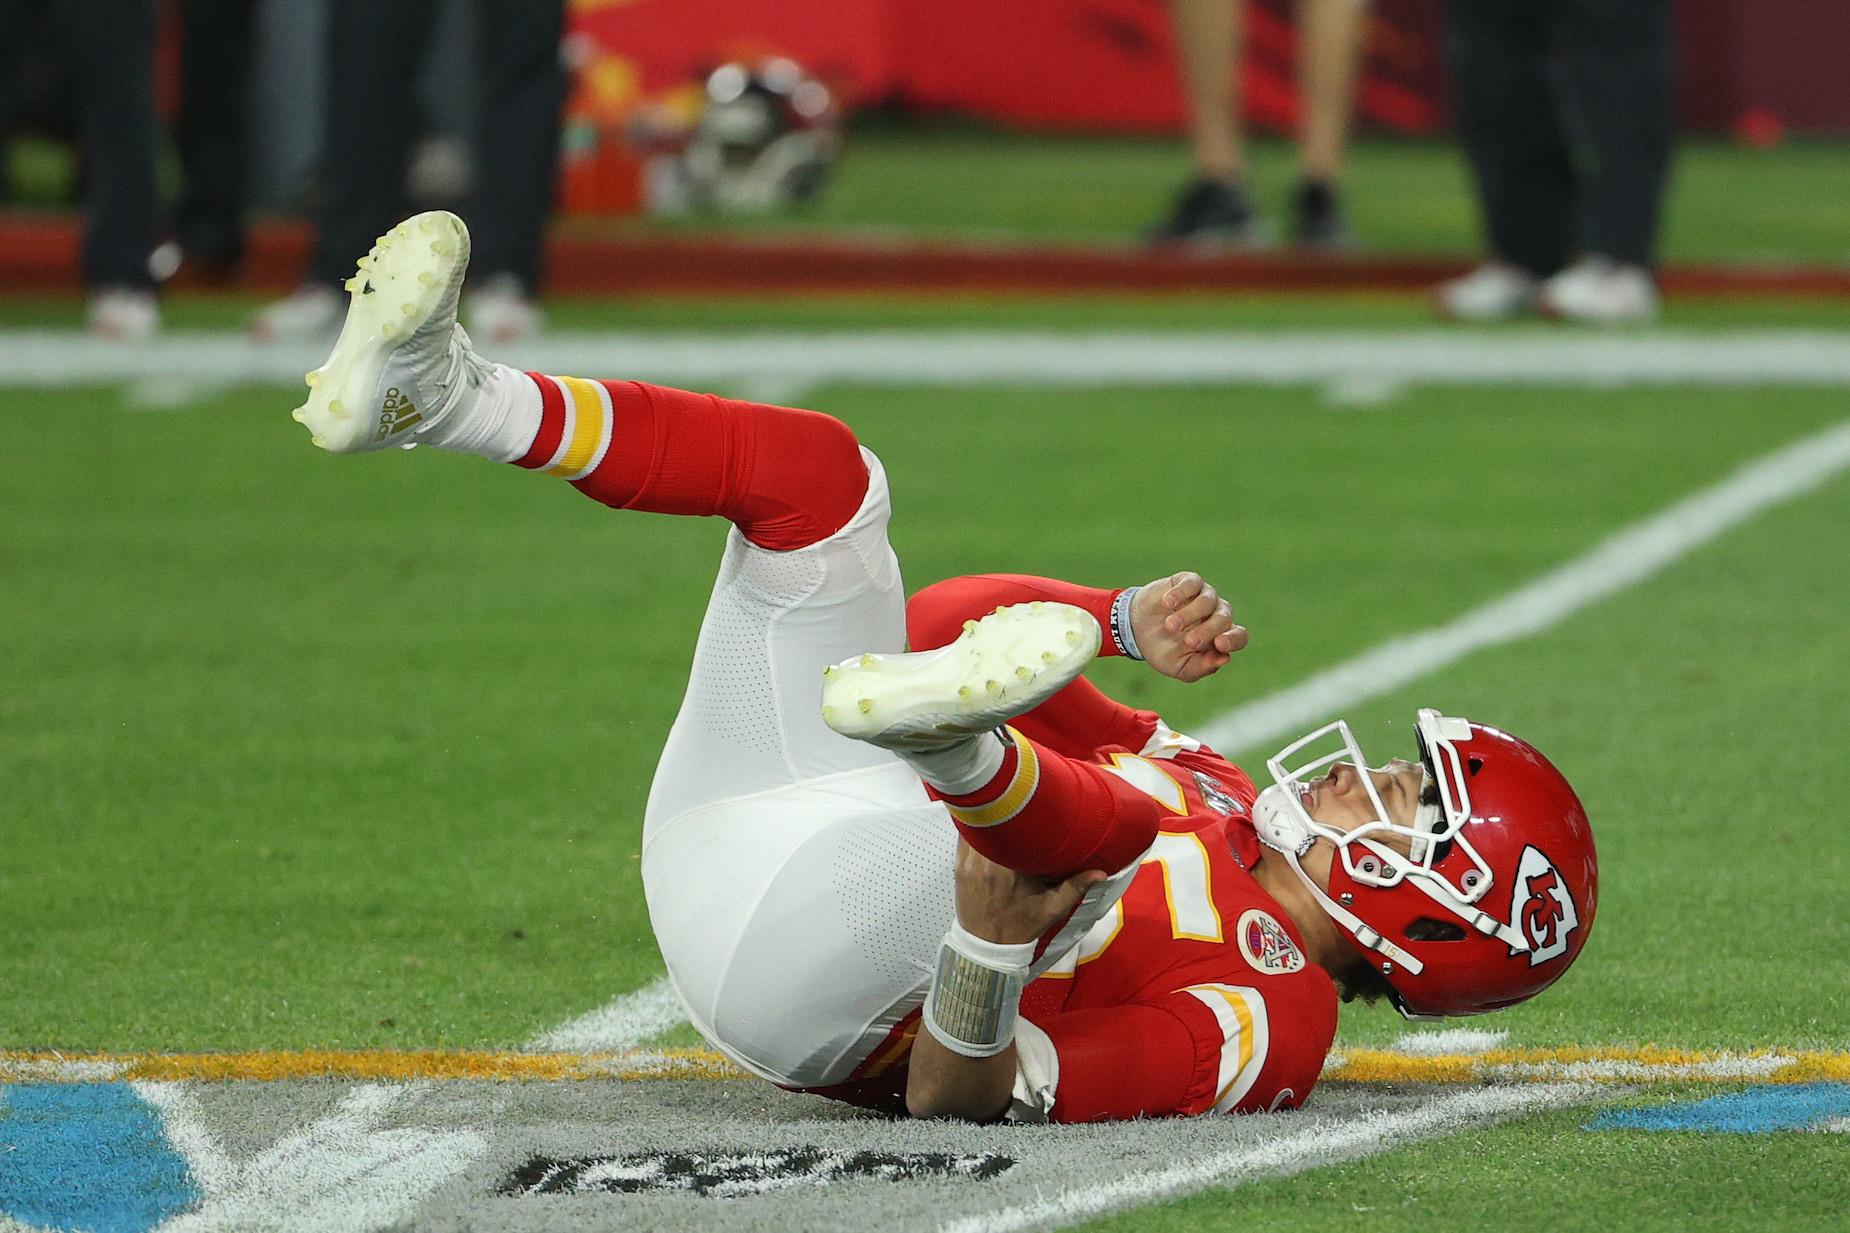 Kansas City Chiefs quarterback Patrick Mahomes lies on the turf during Super Bowl 55.